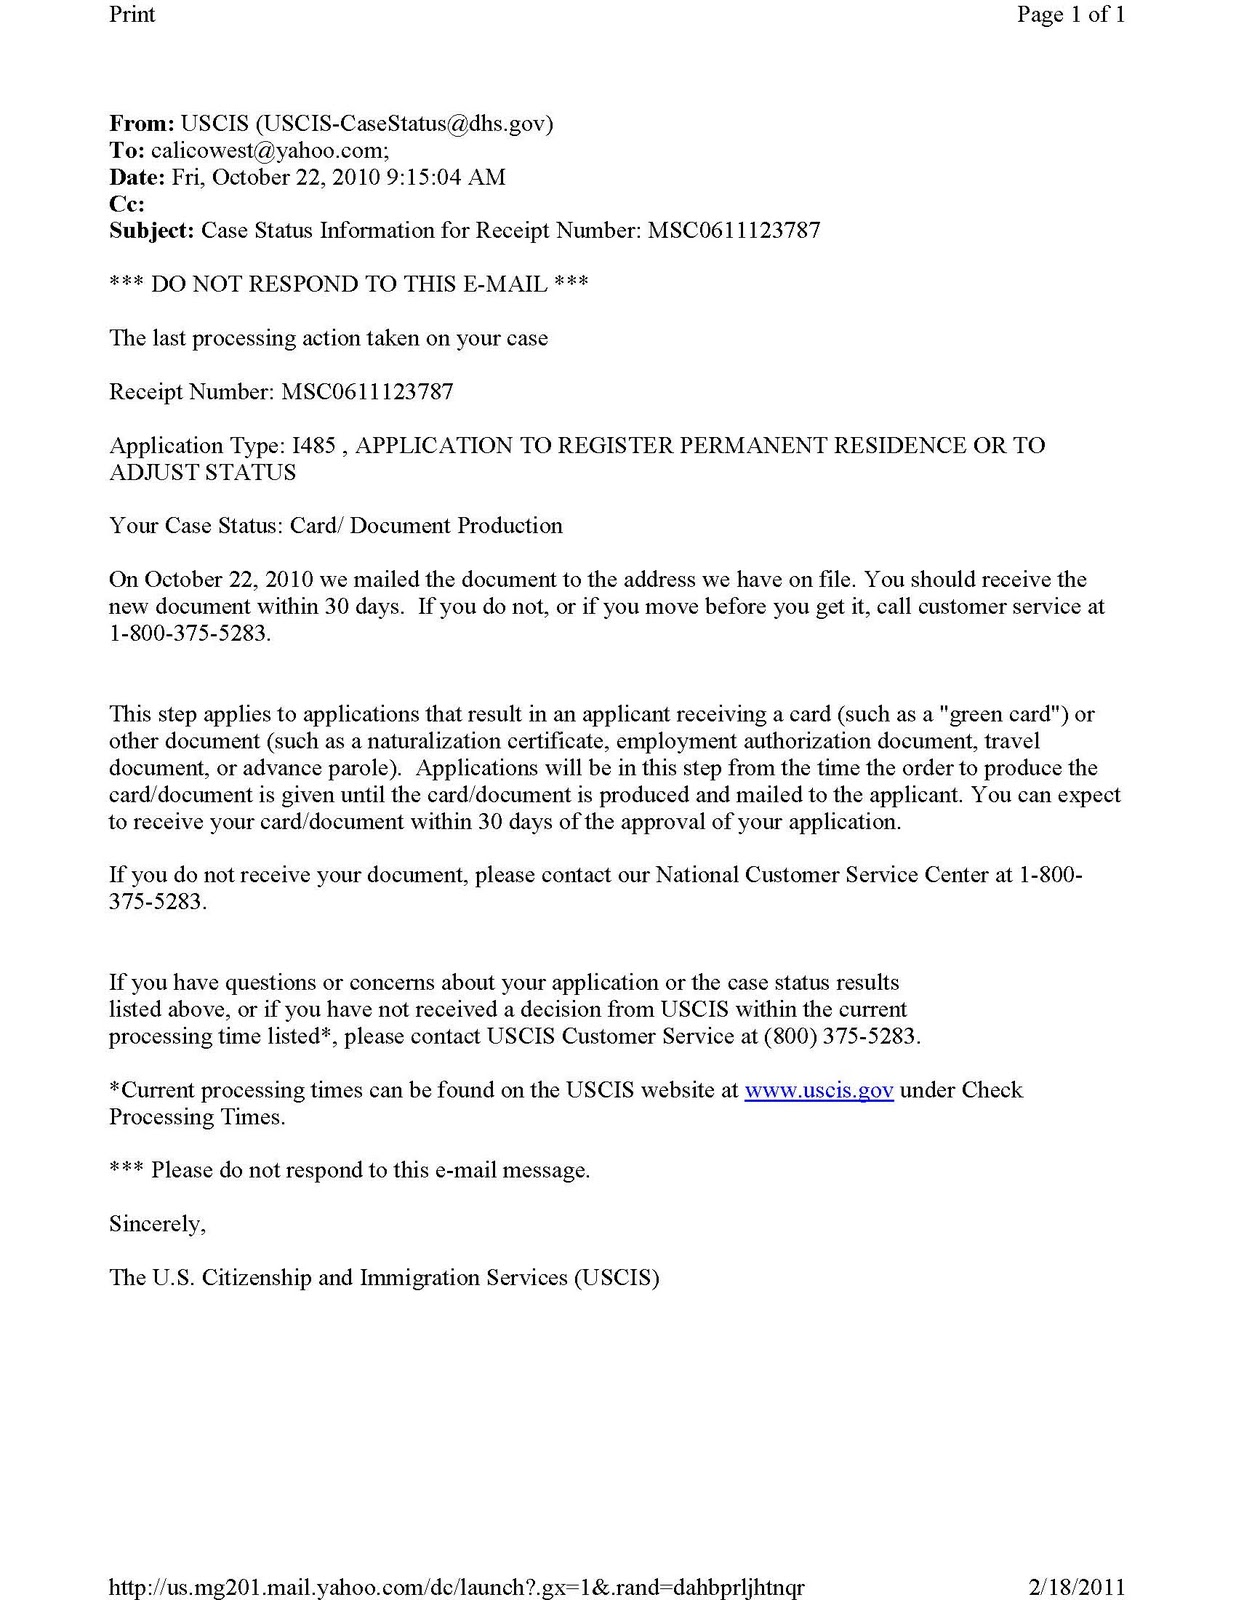 US Immigration Marriage Fraud: USCIS Case Status I-130, I